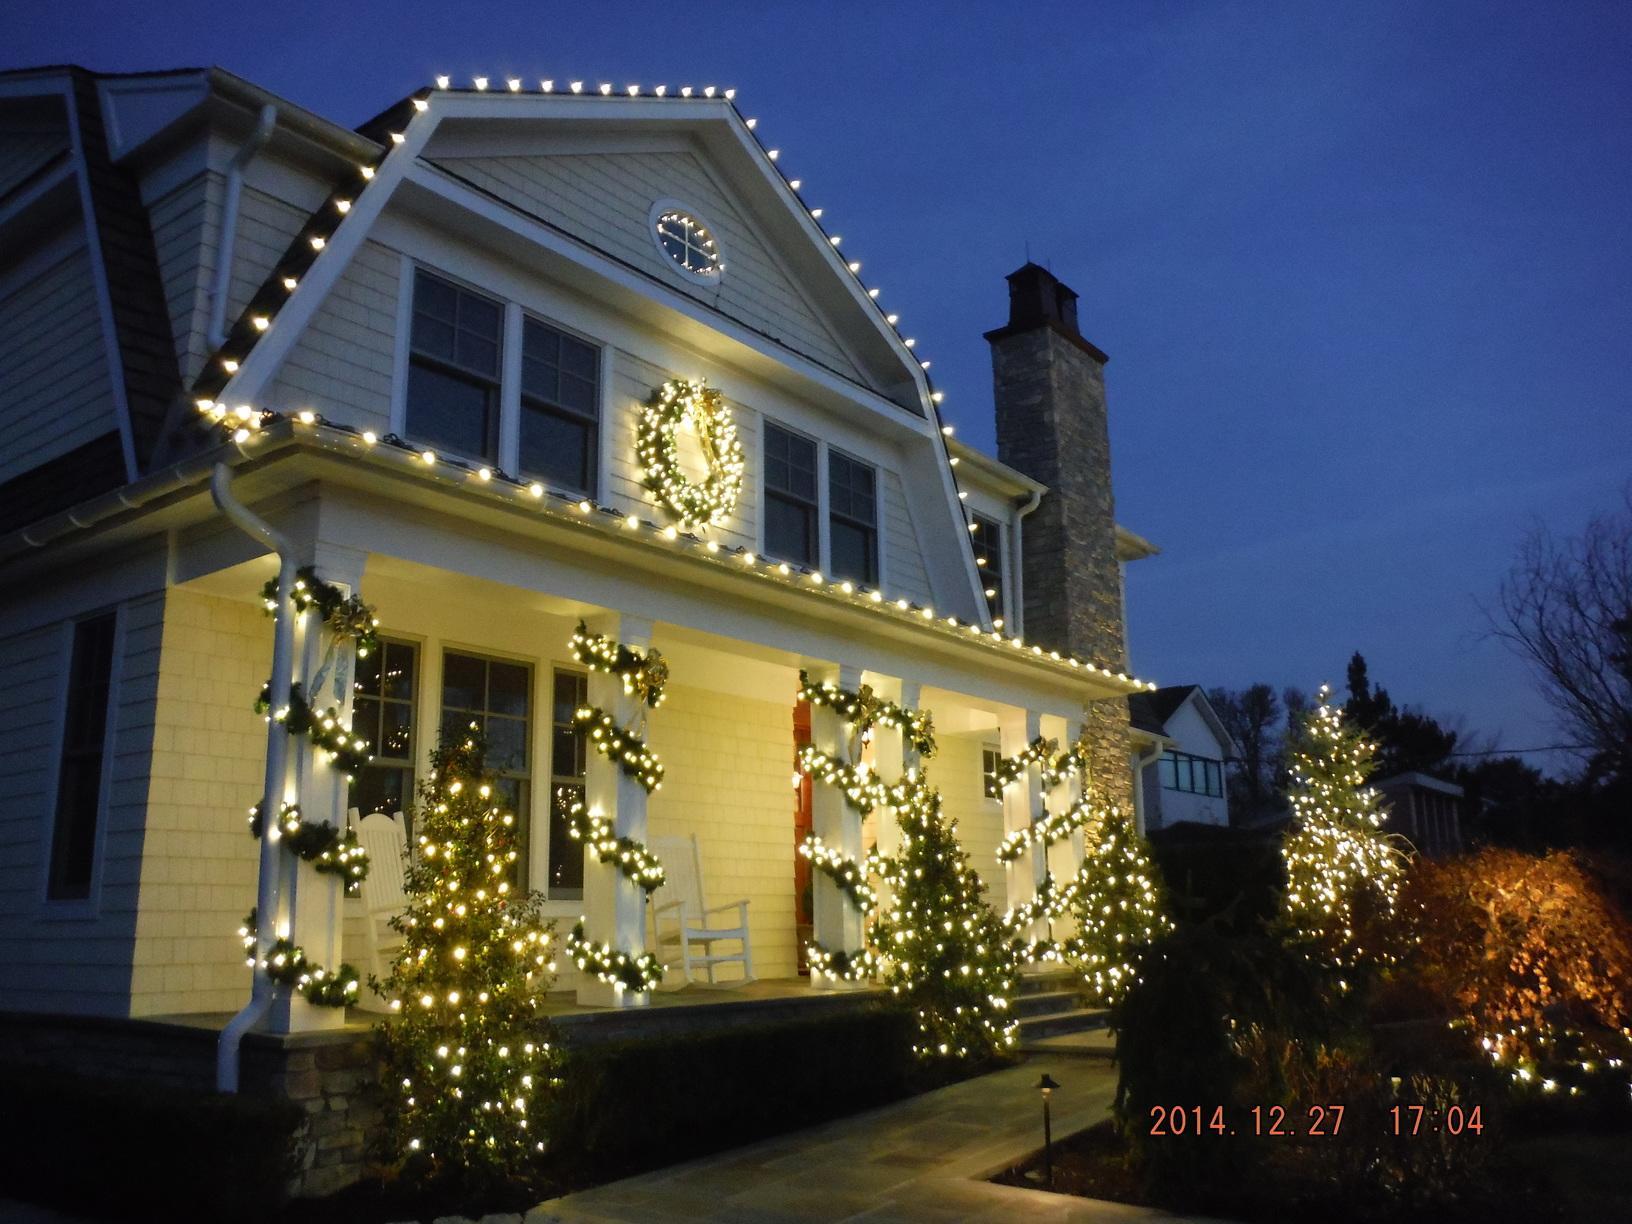 Christmas Light Display in Sea Girt, NJ